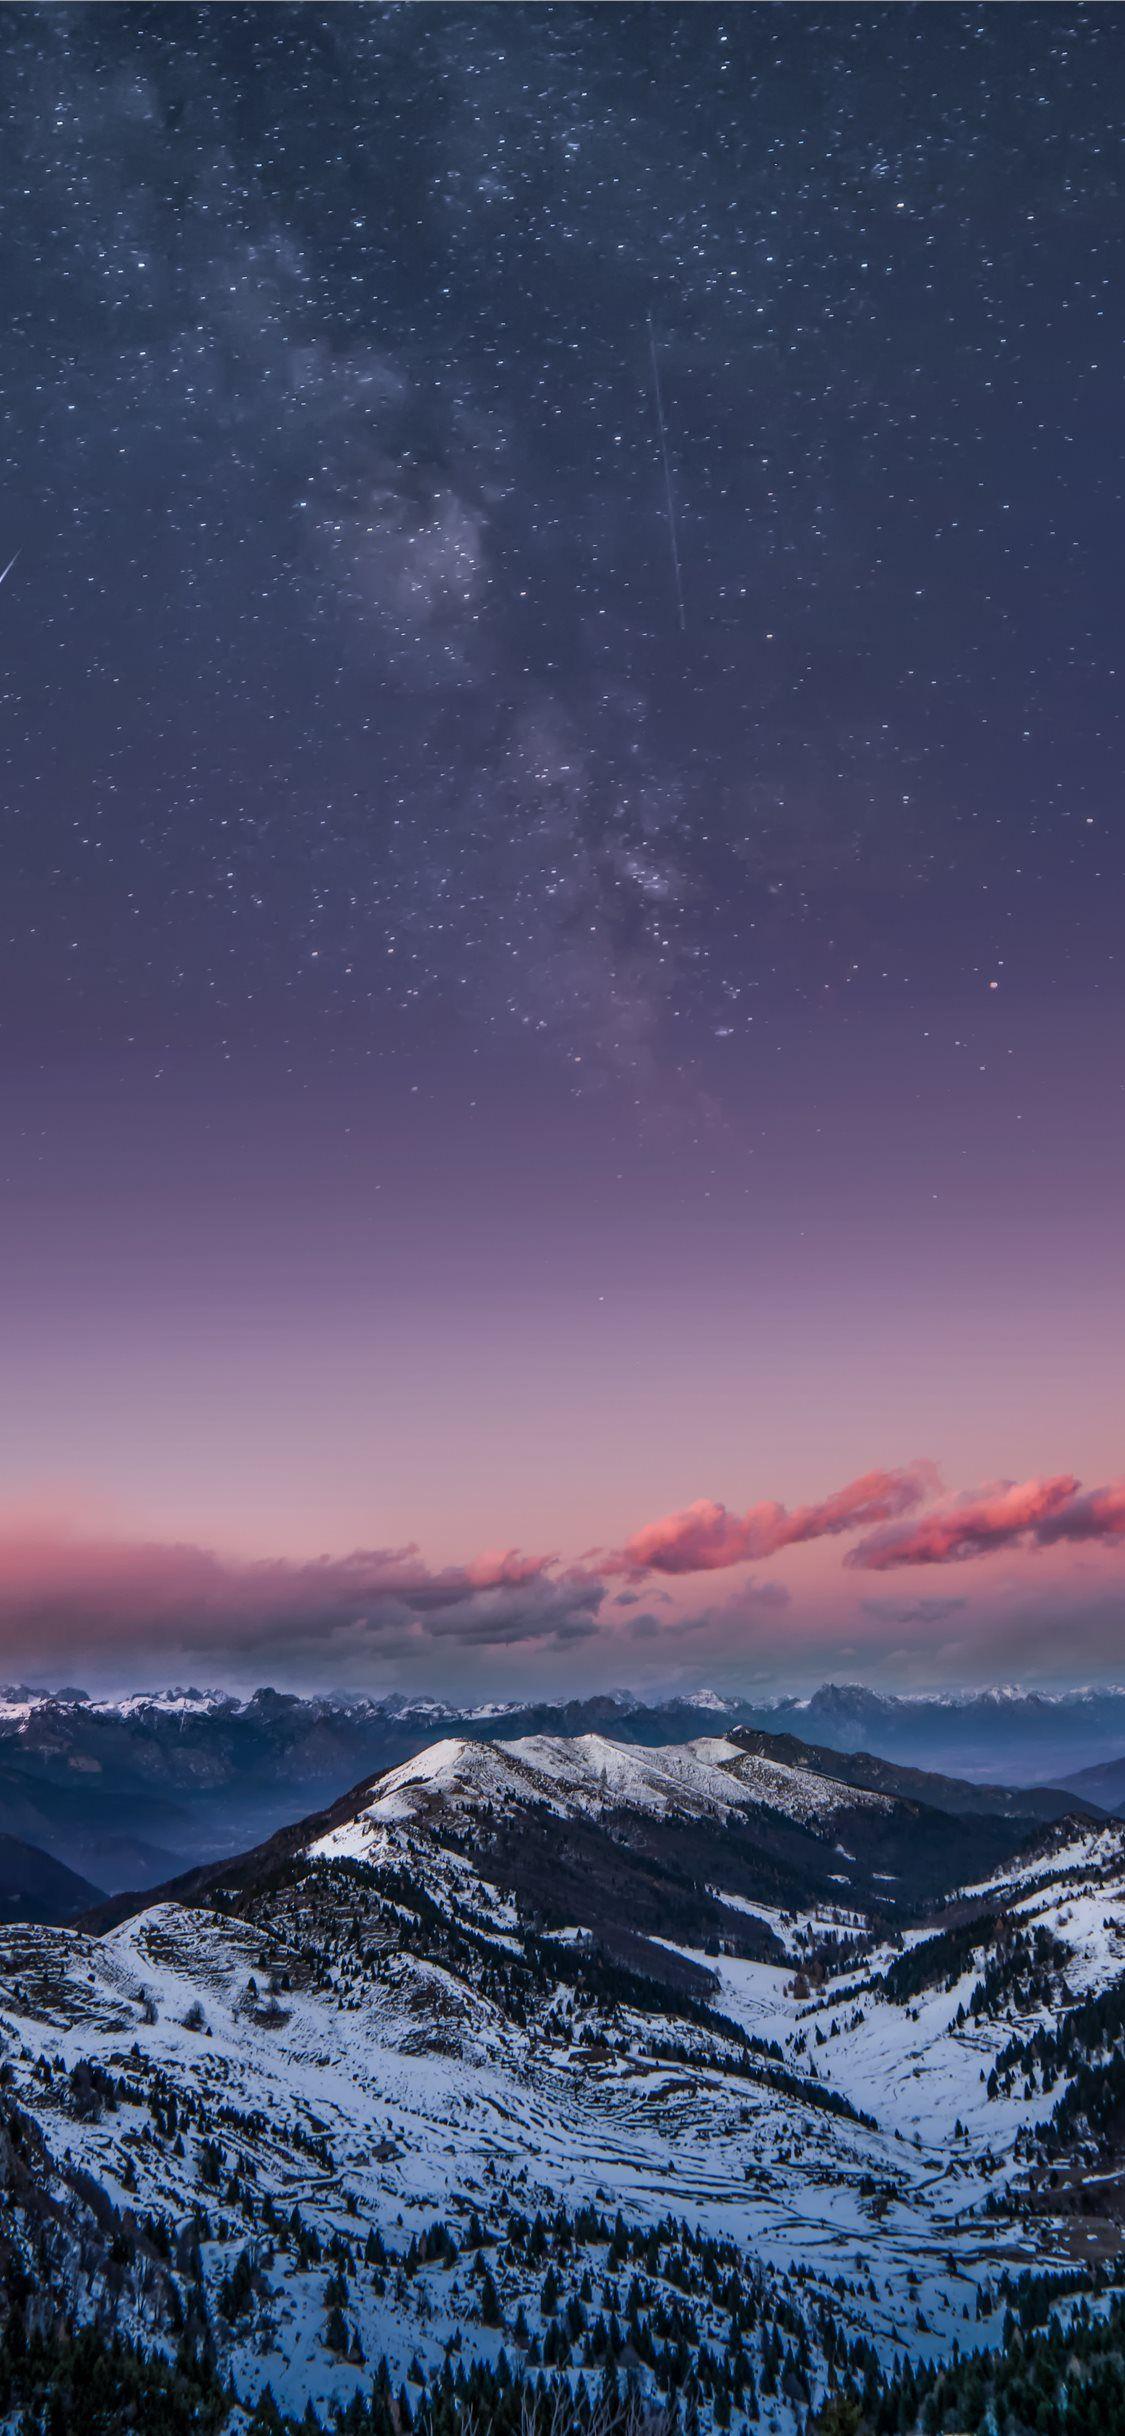 Mountain Milky Way Earth Star Dolomites Italy Longexposure Longesxposure Natureimage W Iphone Wallpaper Mountains Landscape Wallpaper Nature Wallpaper